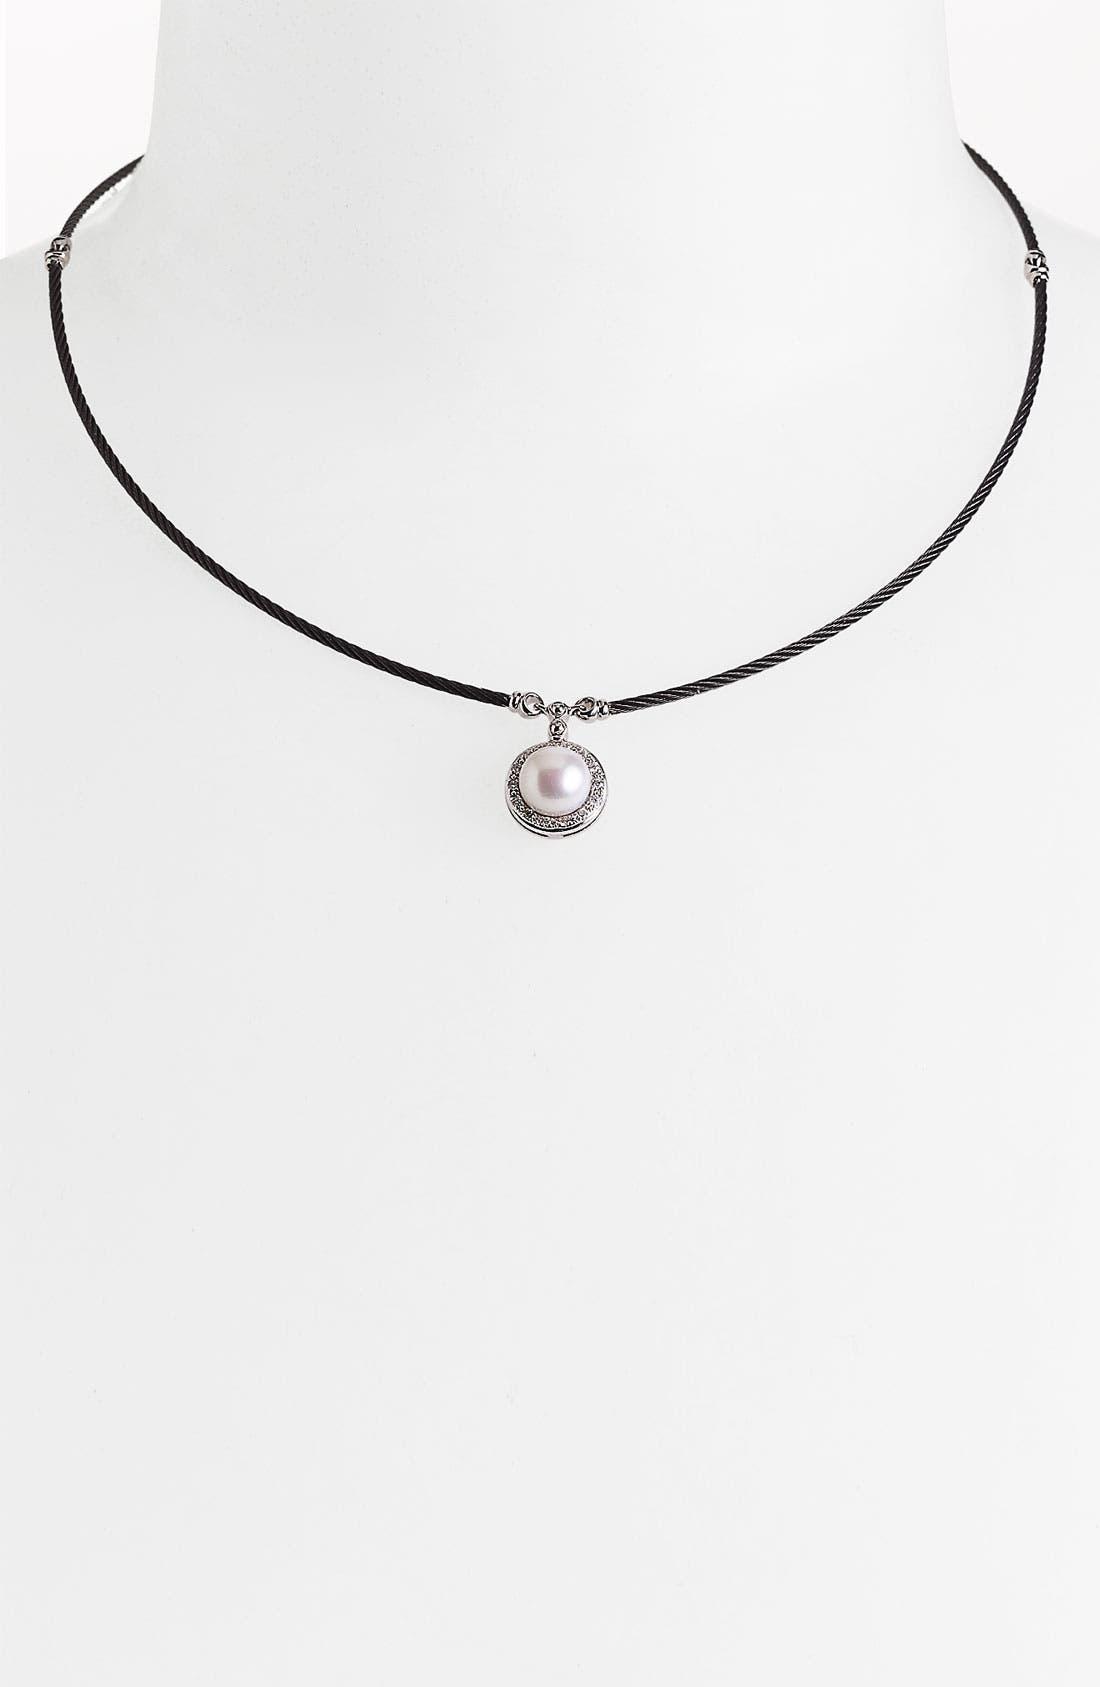 Main Image - ALOR® Pearl & Diamond Pendant Necklace